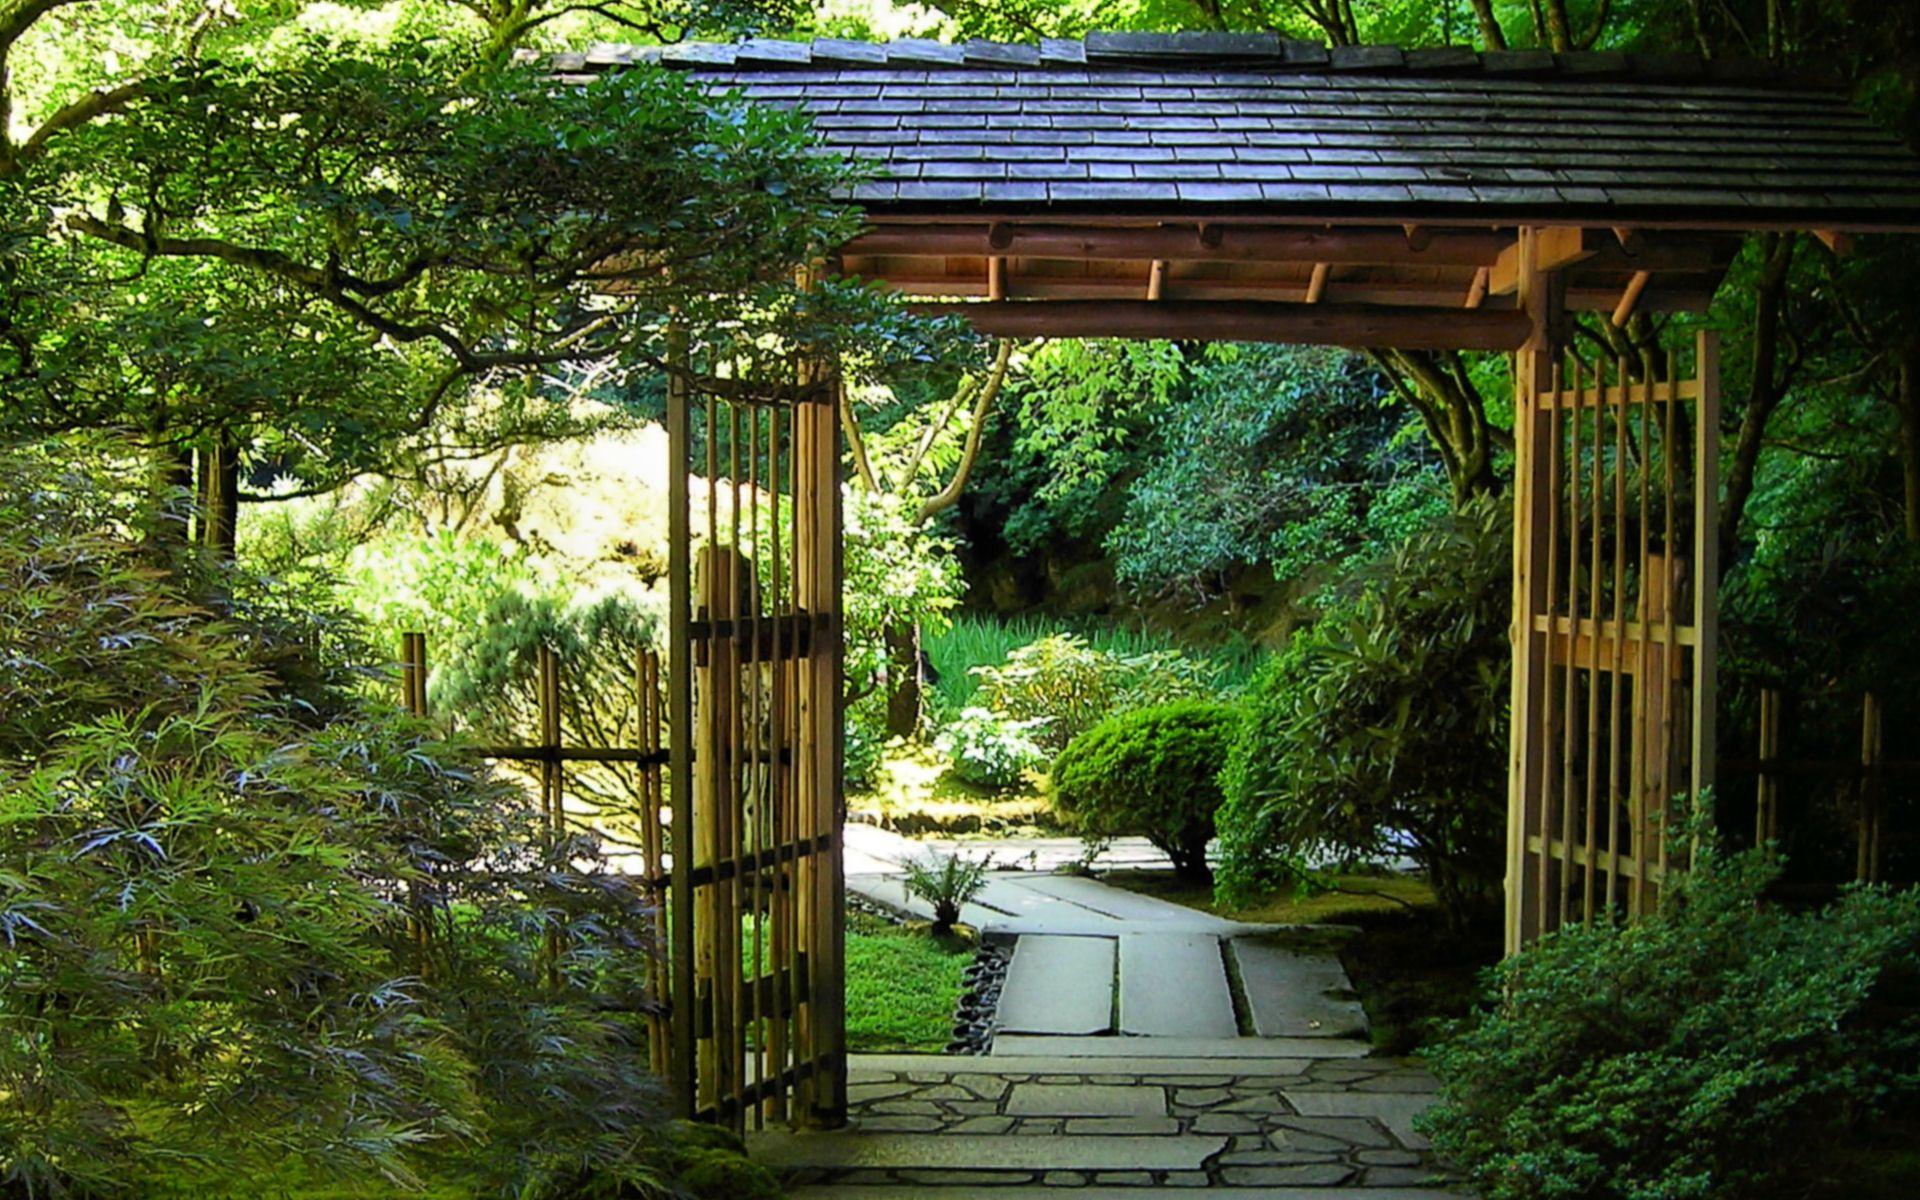 Mobile And Desktop Wallpaper Hd In 2020 Japan Garden Dream Garden Backyard